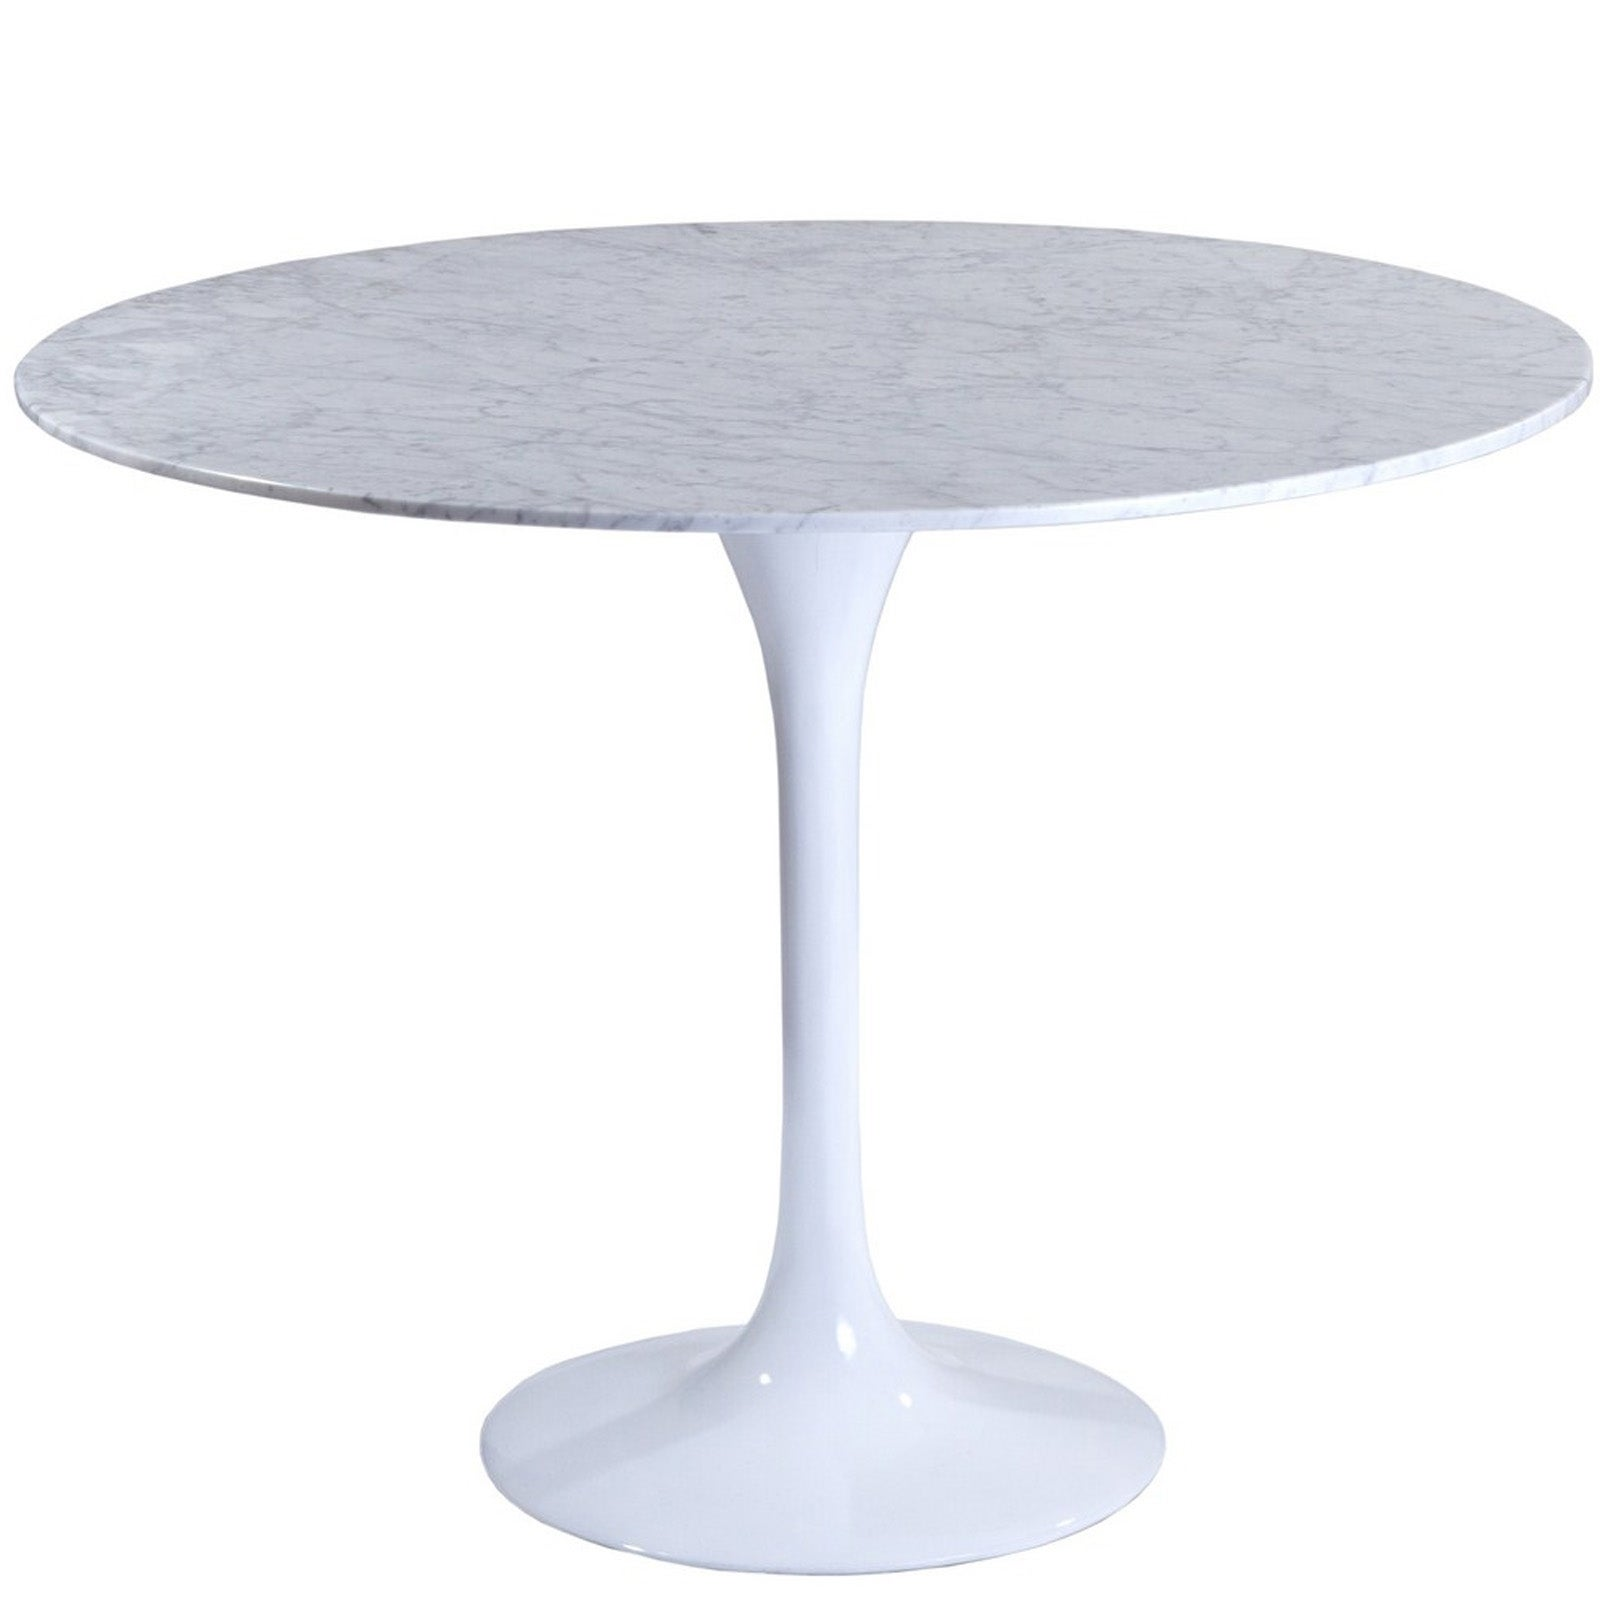 eero saarinen style inch white marble top tulip dining table saarinen marble dining table: 40 inch round pedestal dining table